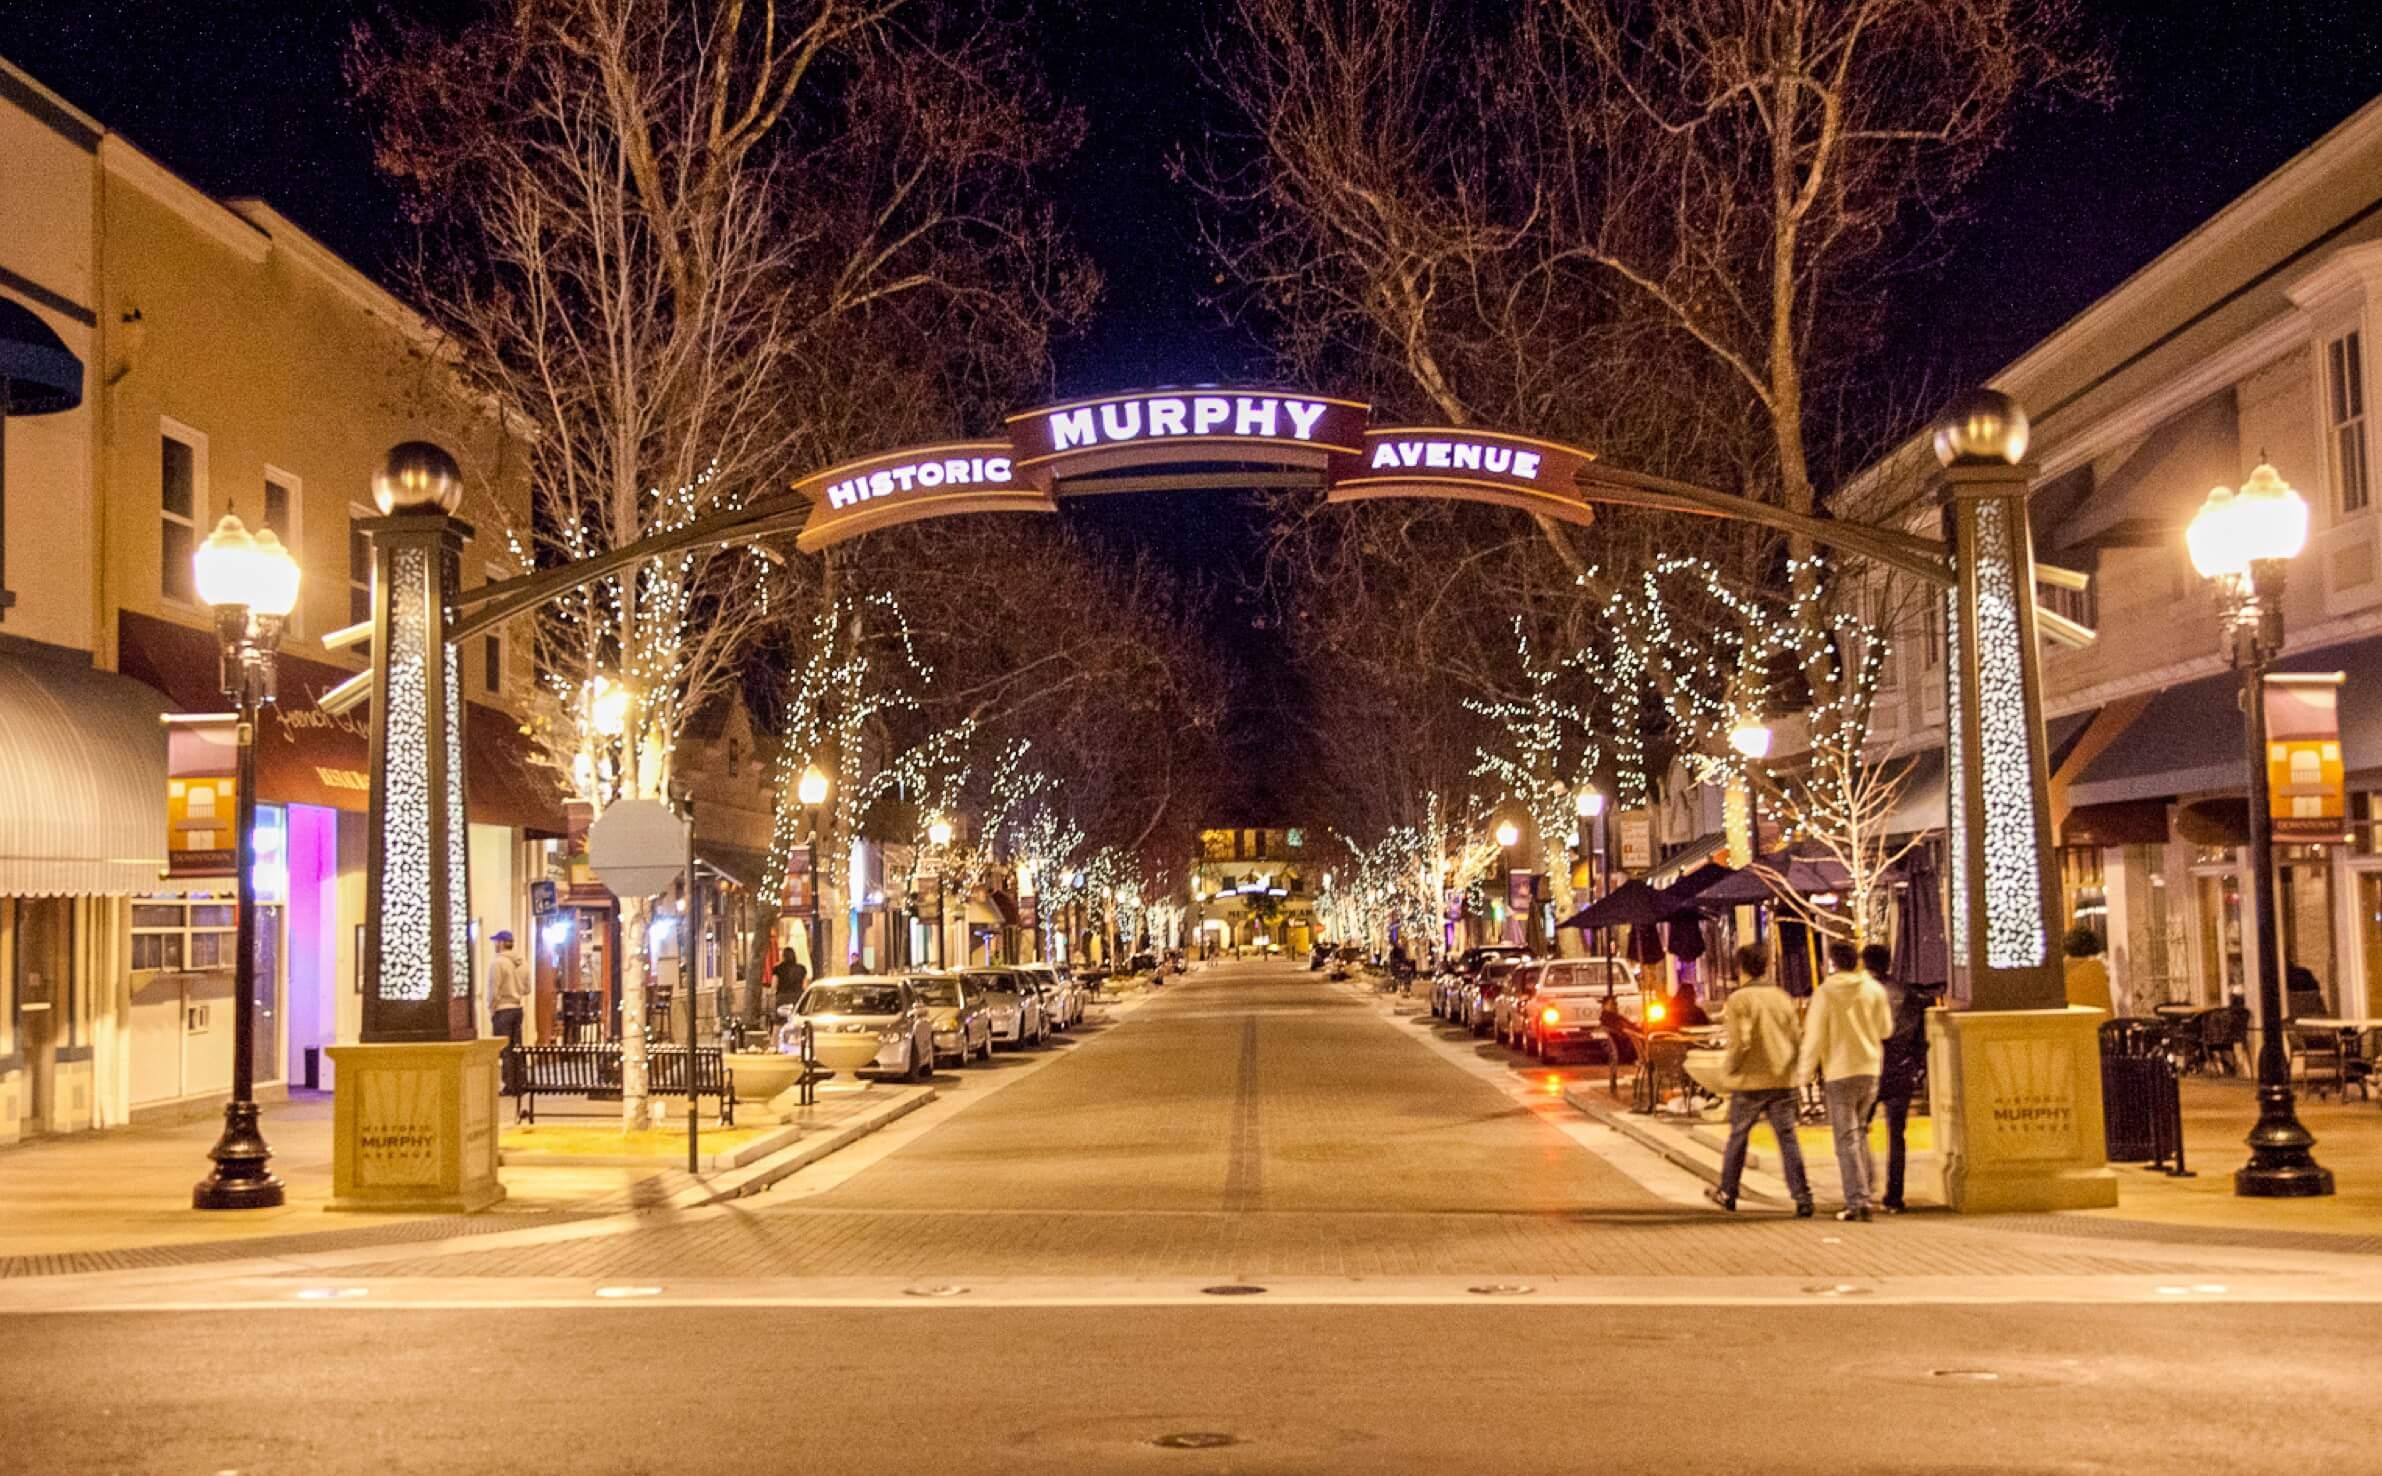 Historic Murphy Avenue in Sunnyvale at night